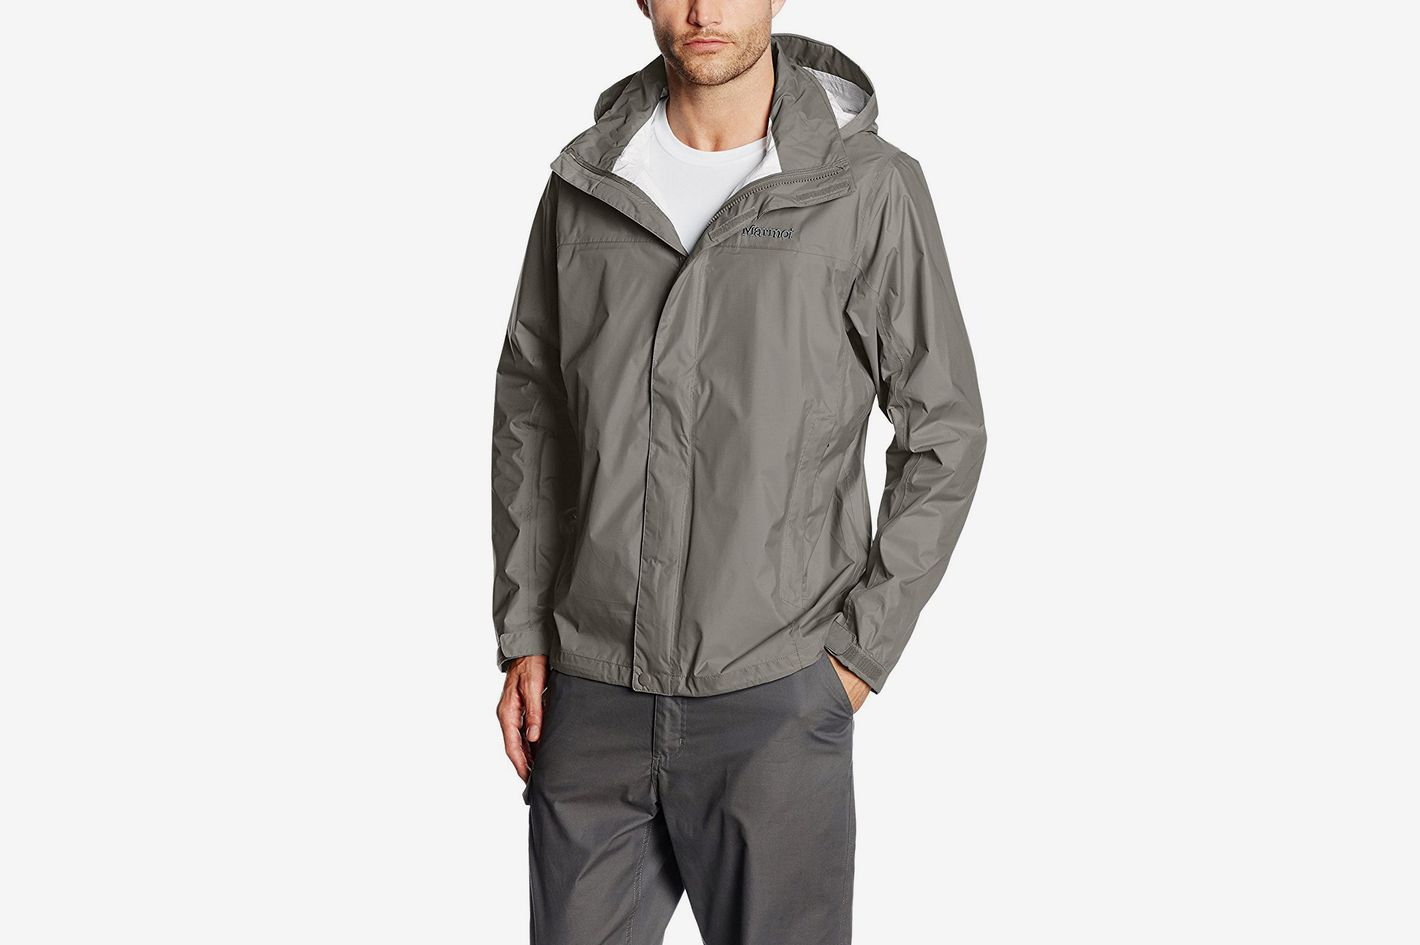 d7342749445 Best short rain jacket with a chin guard. Marmot Precip Jacket